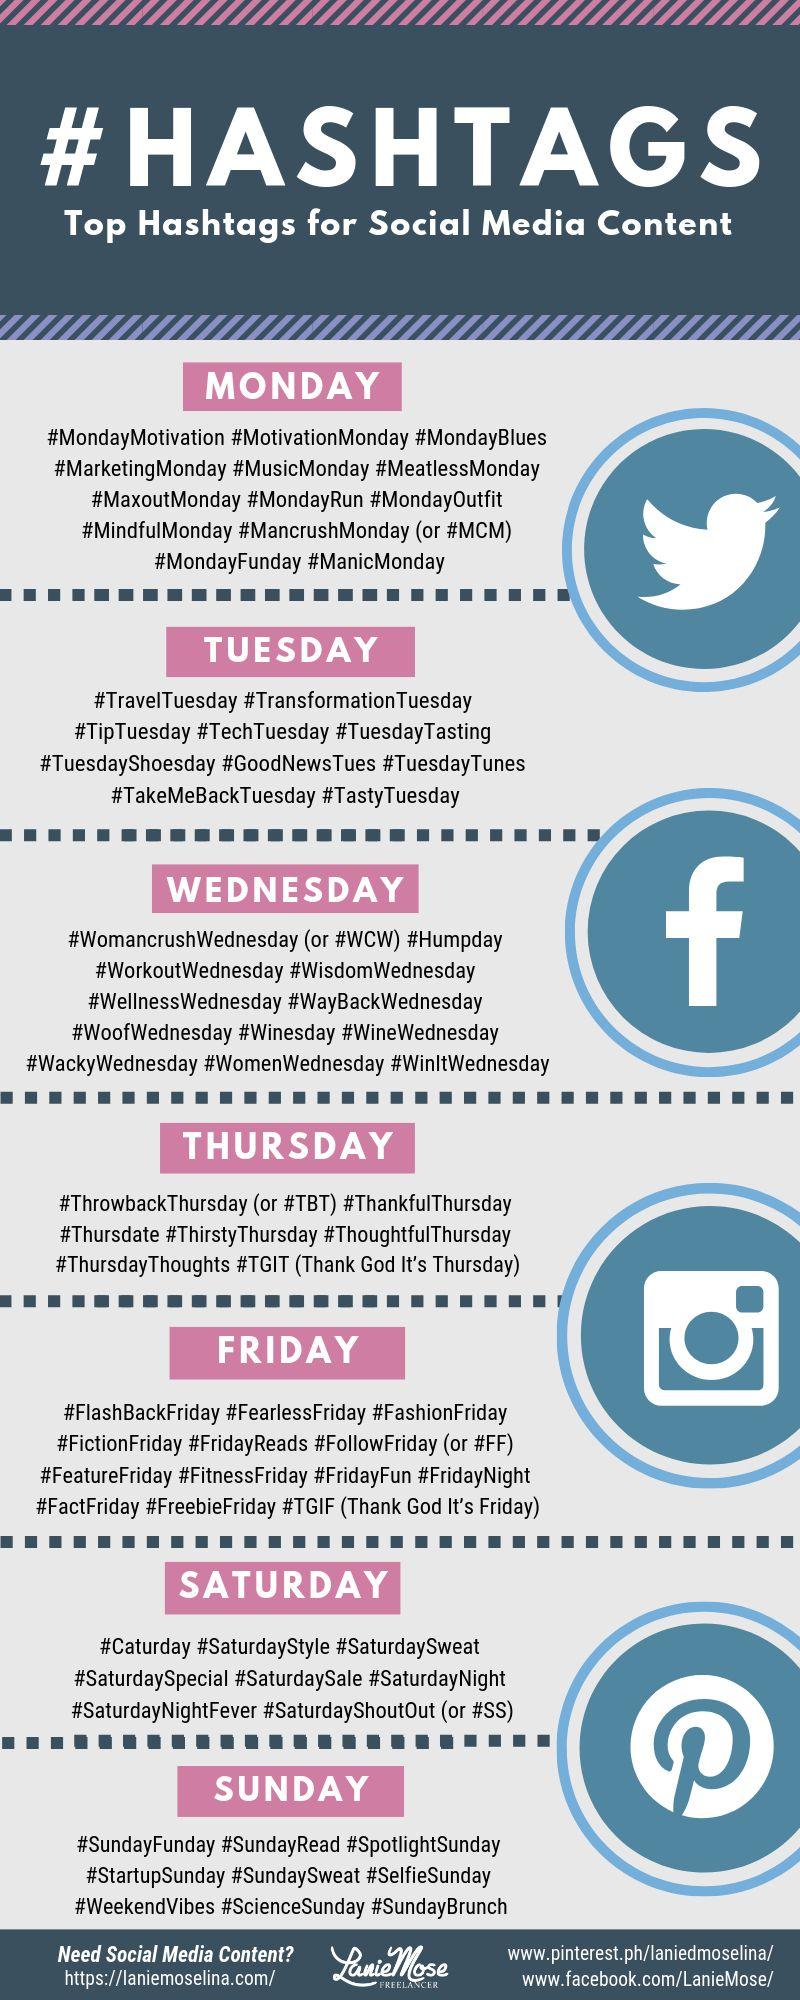 Hashtags For Social Media Content Social Media Hashtags Social Media Daily Social Media Content